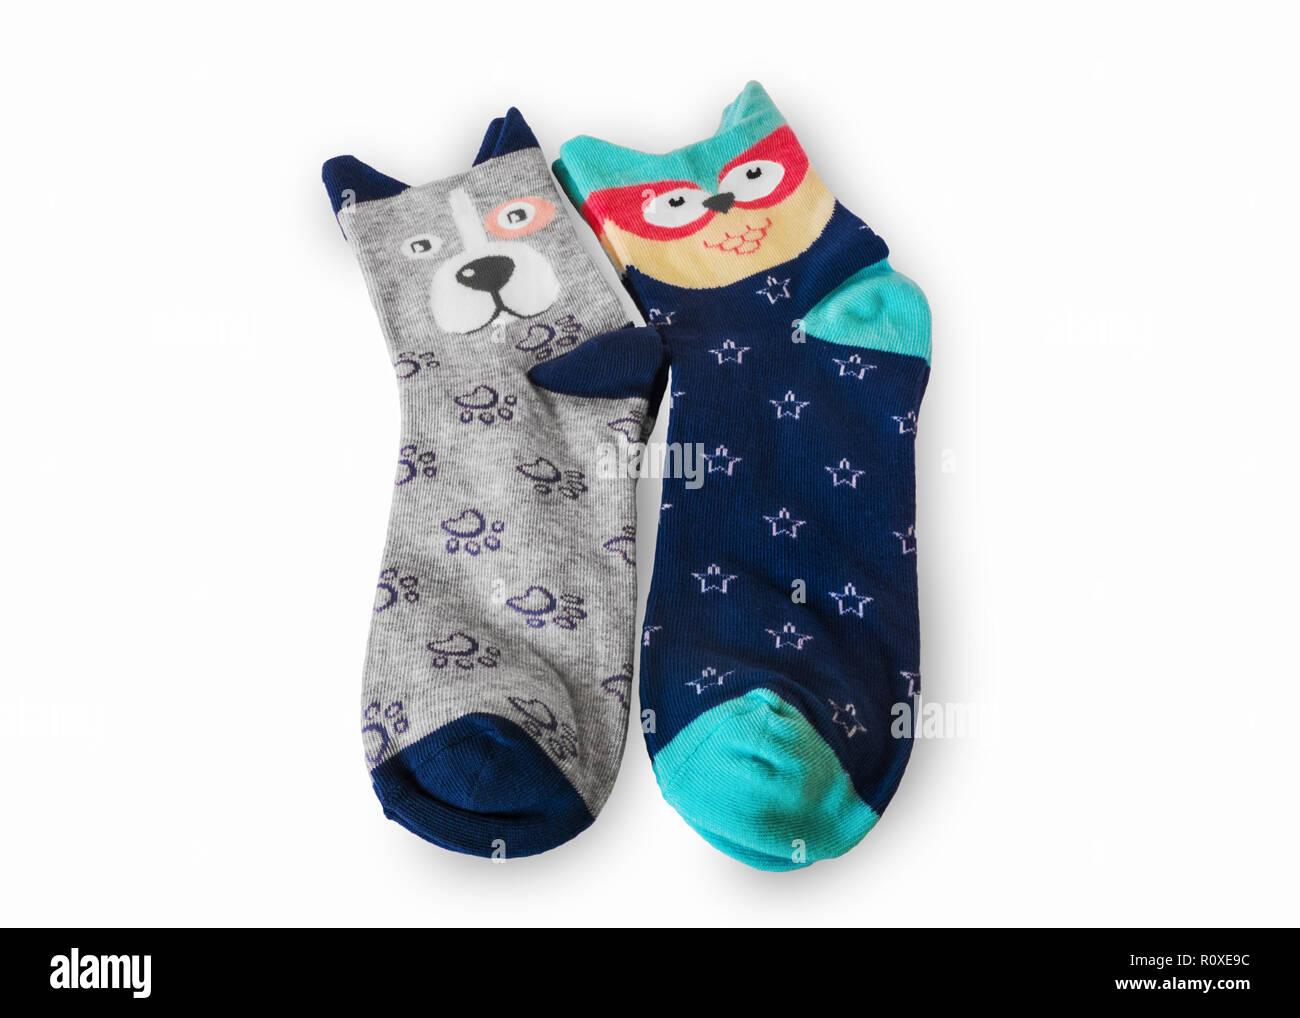 Funny socks on white background - Stock Image